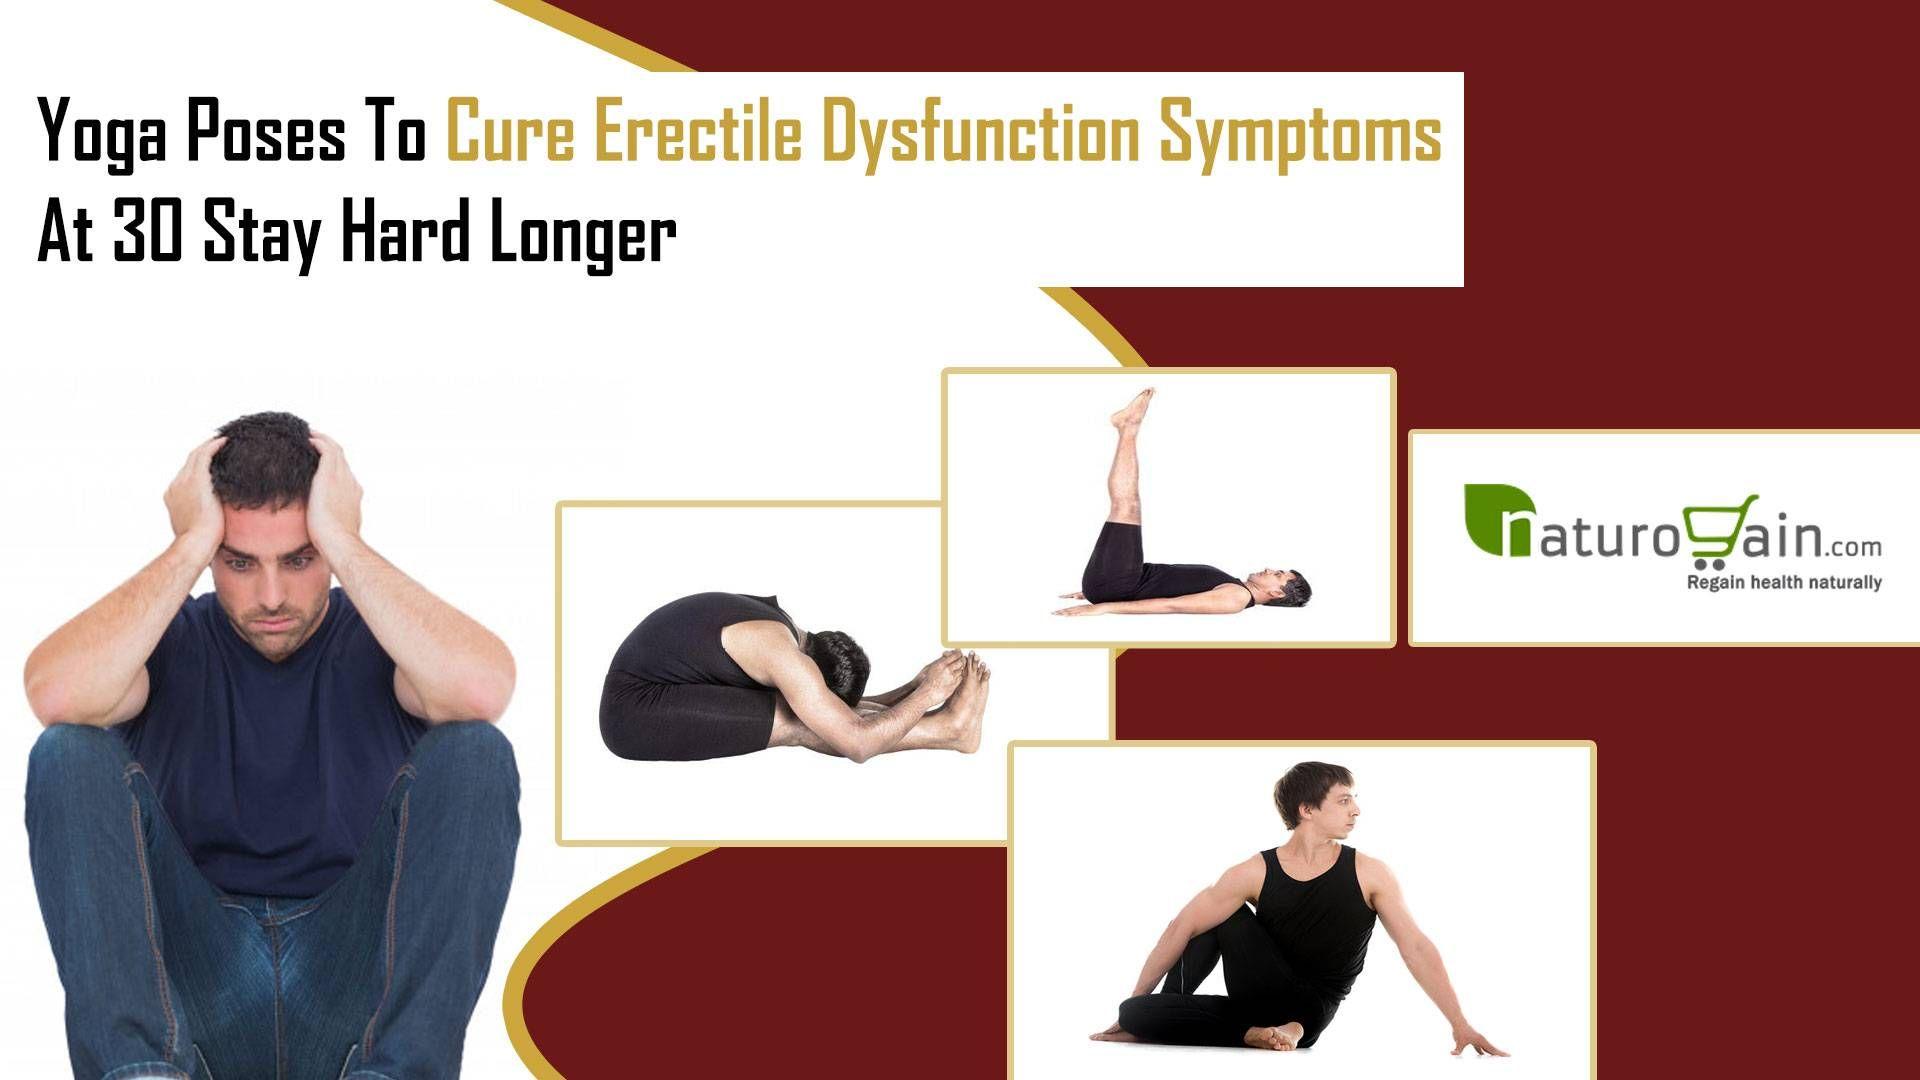 Paschimottanasana For Erectile Dysfunction